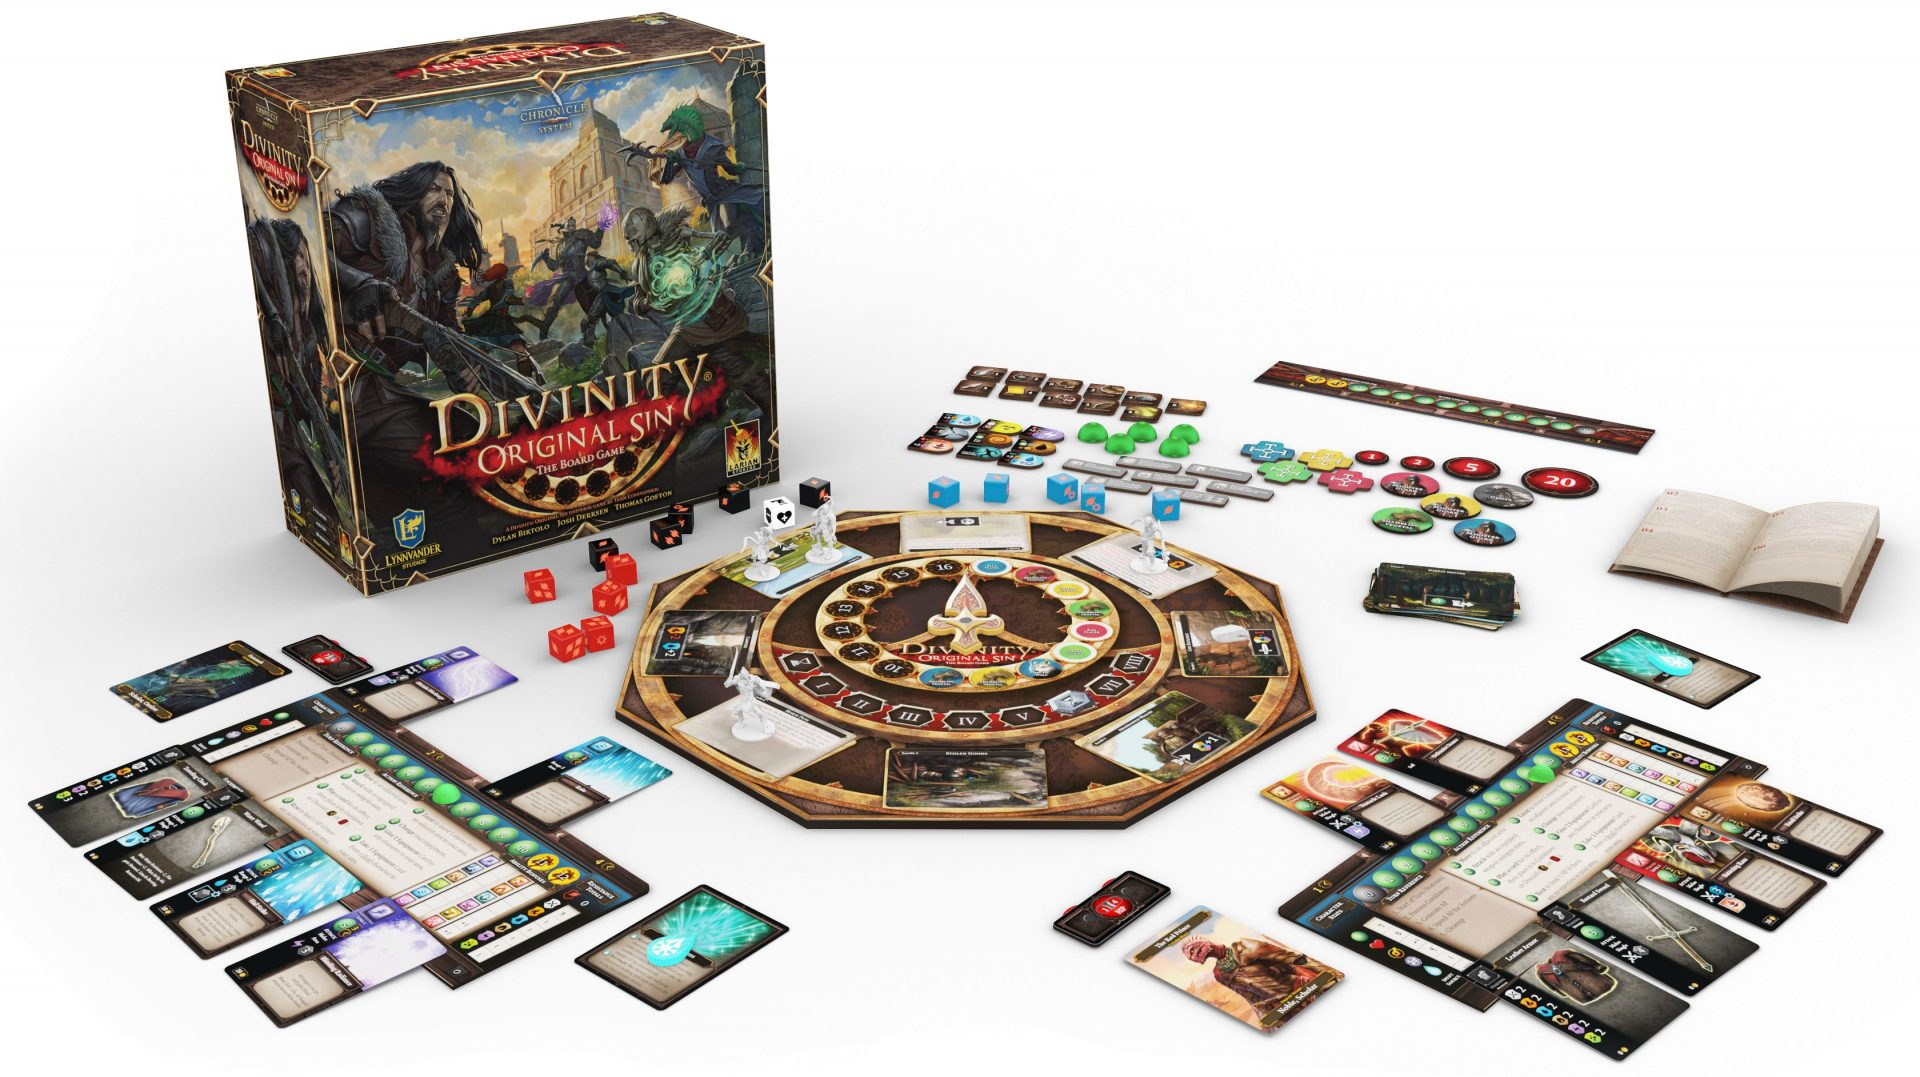 Divinity: Original Sin 2 Board Game